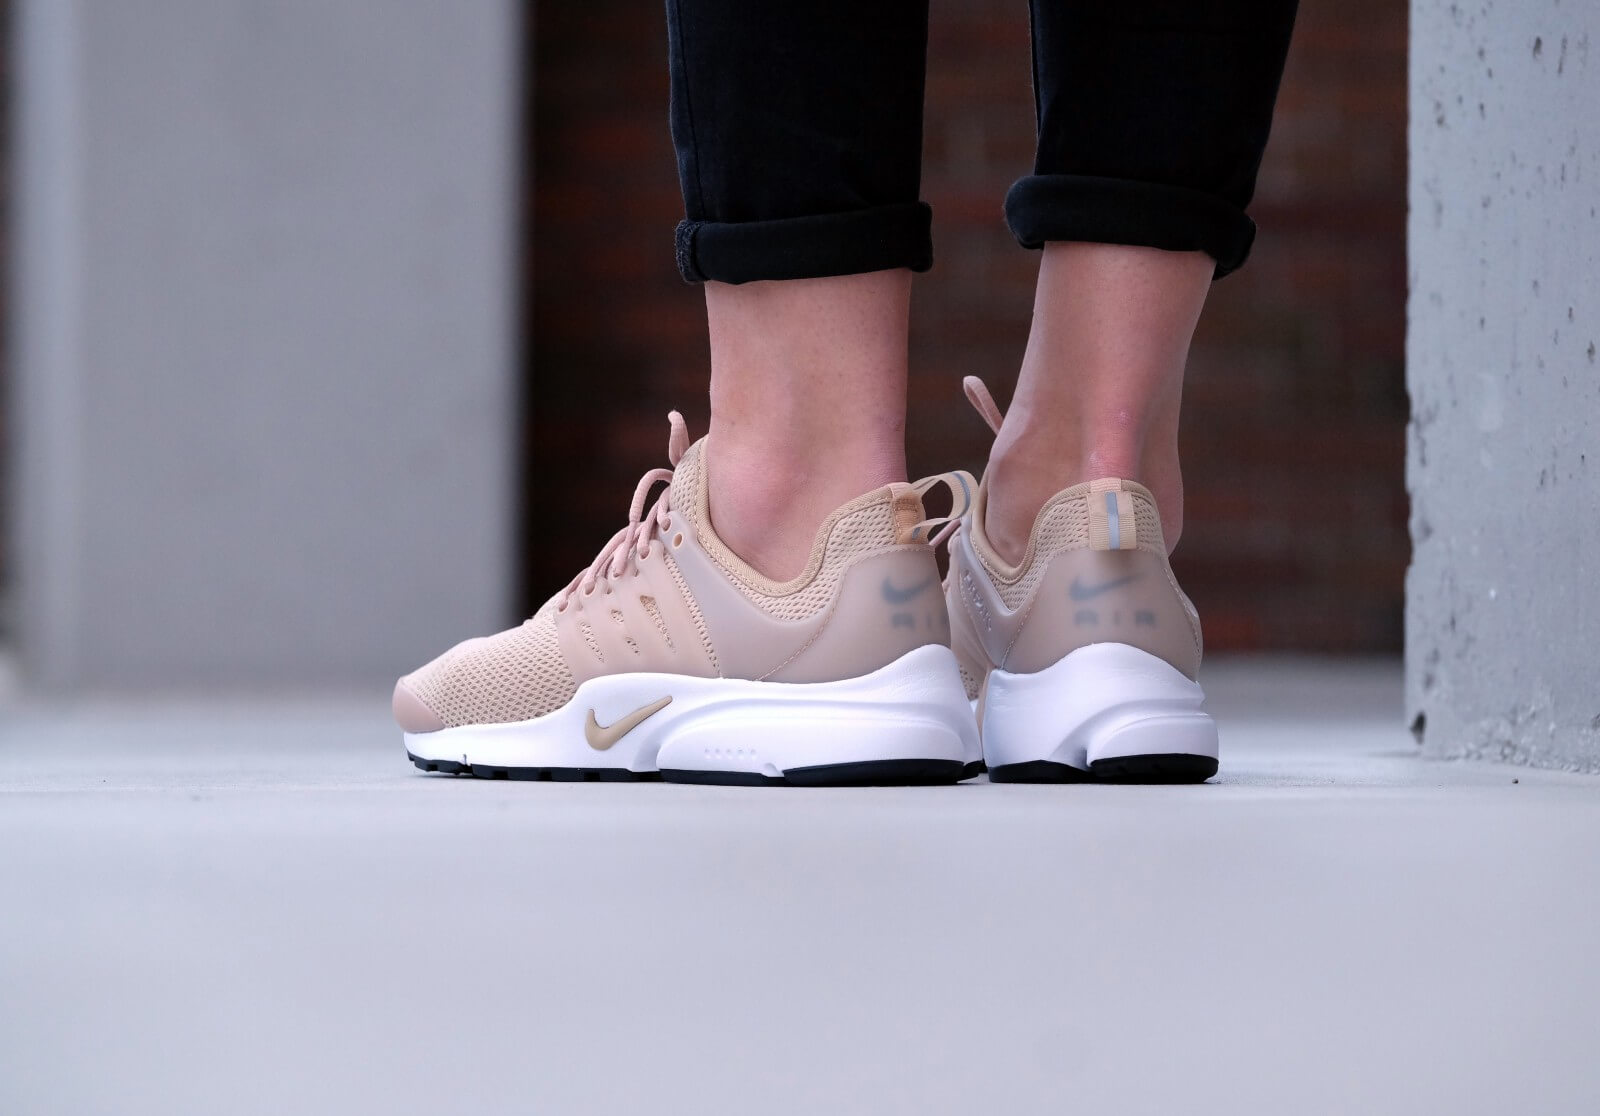 Nike Wmns Air Presto Linen/linen-black-white - 878068-200